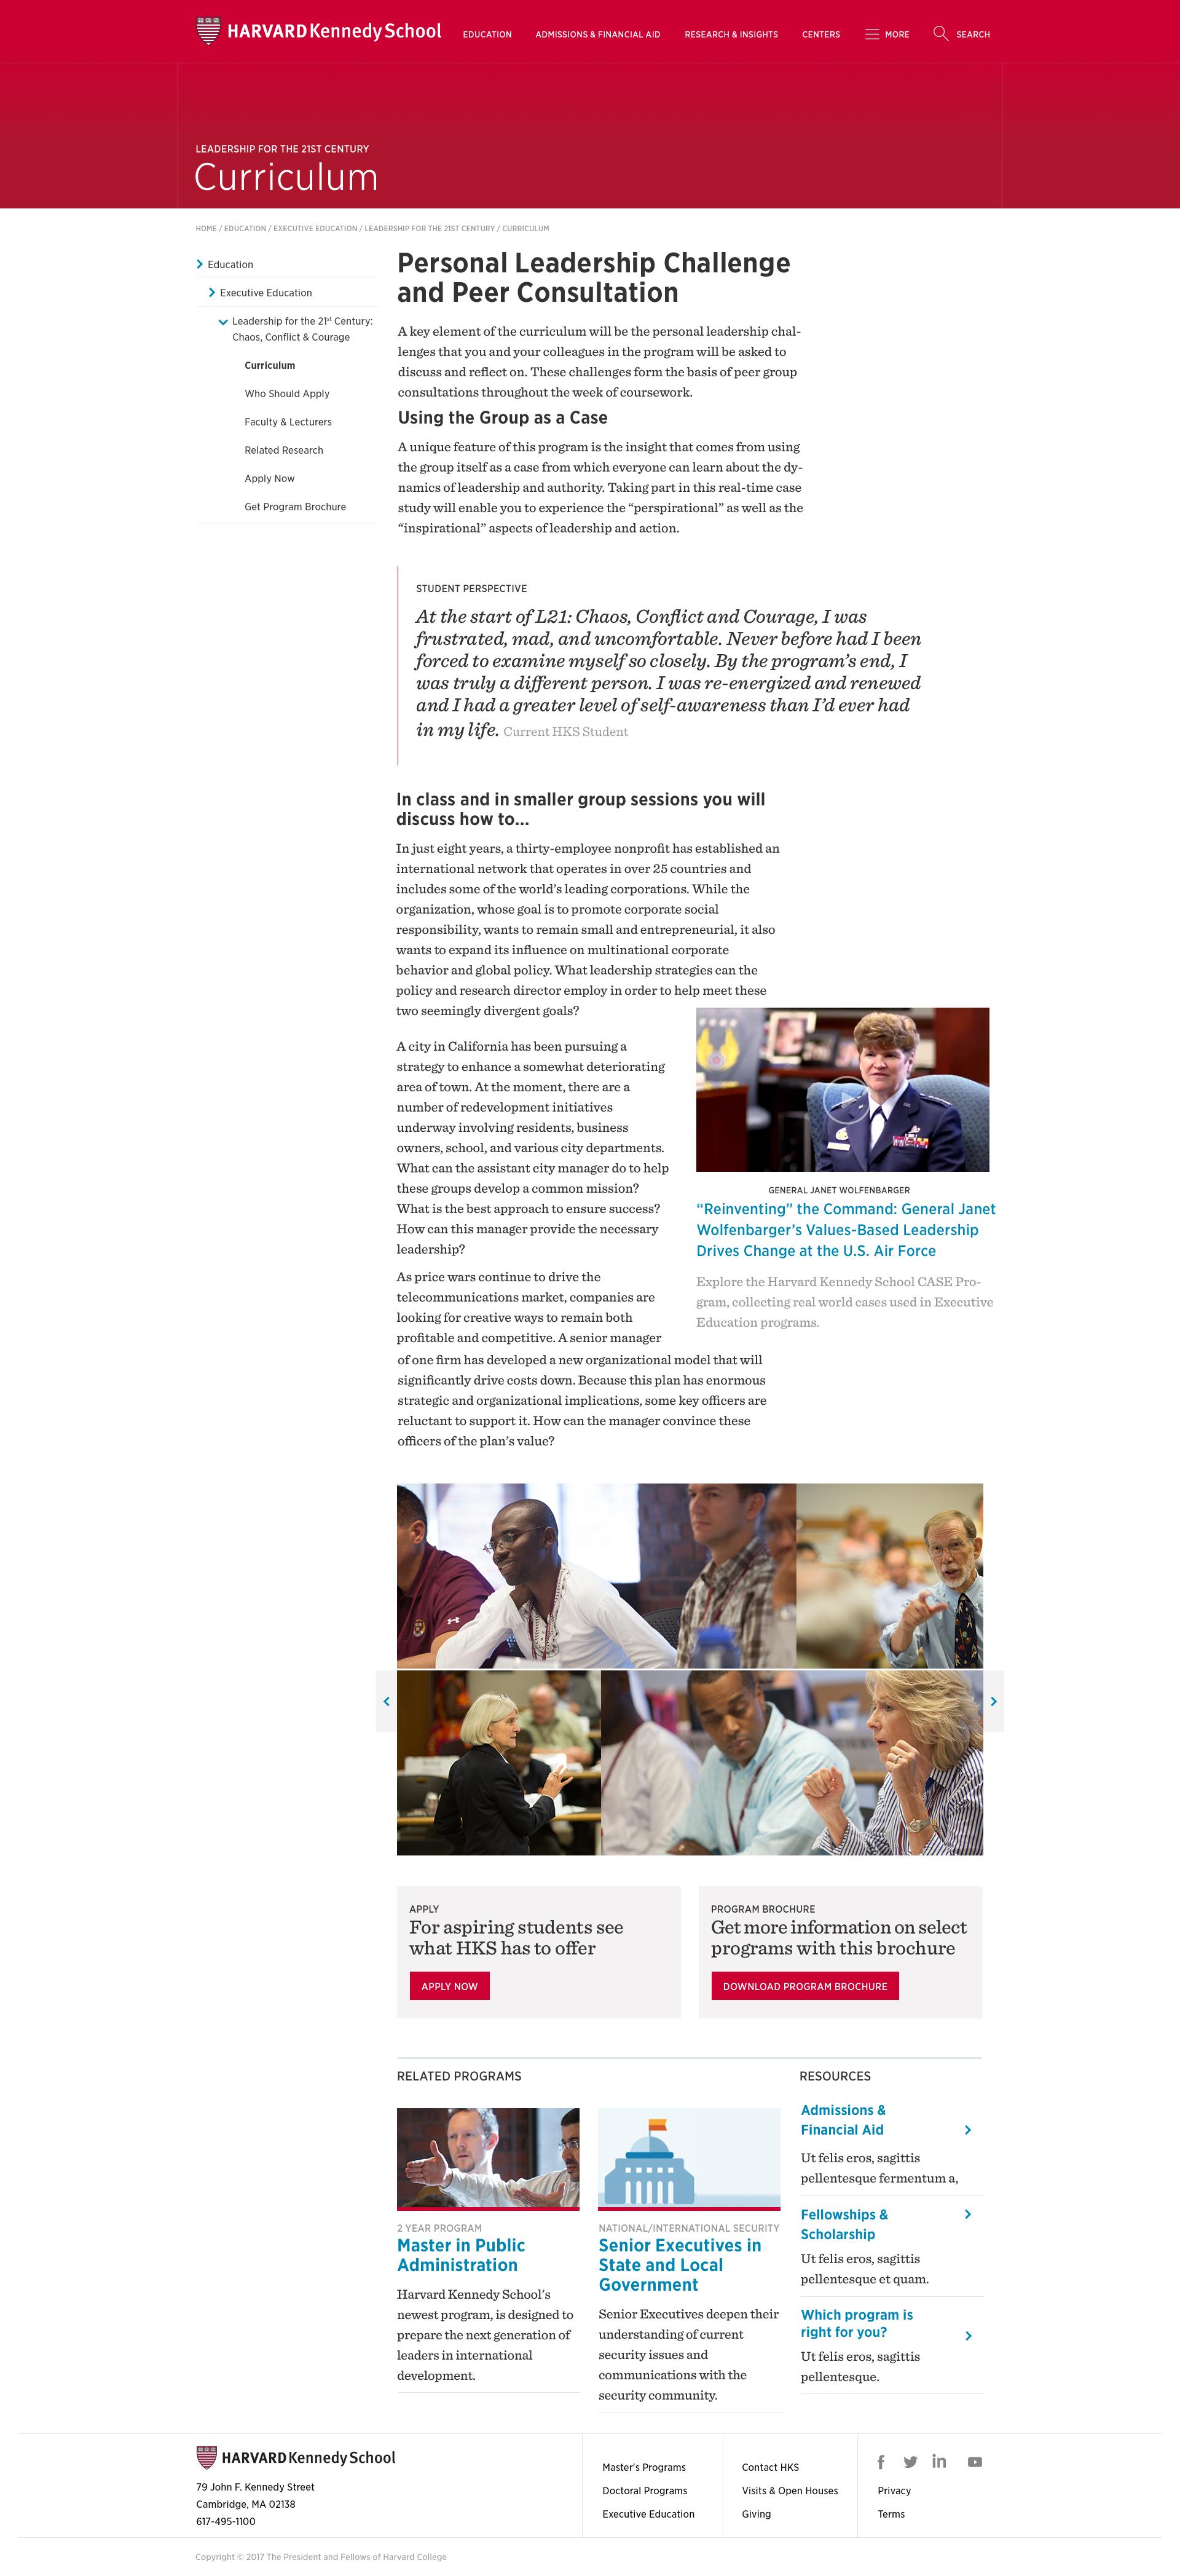 hksT5-1-3-n_Exec-Ed-Leadership-in-21st-Century-Curriculum